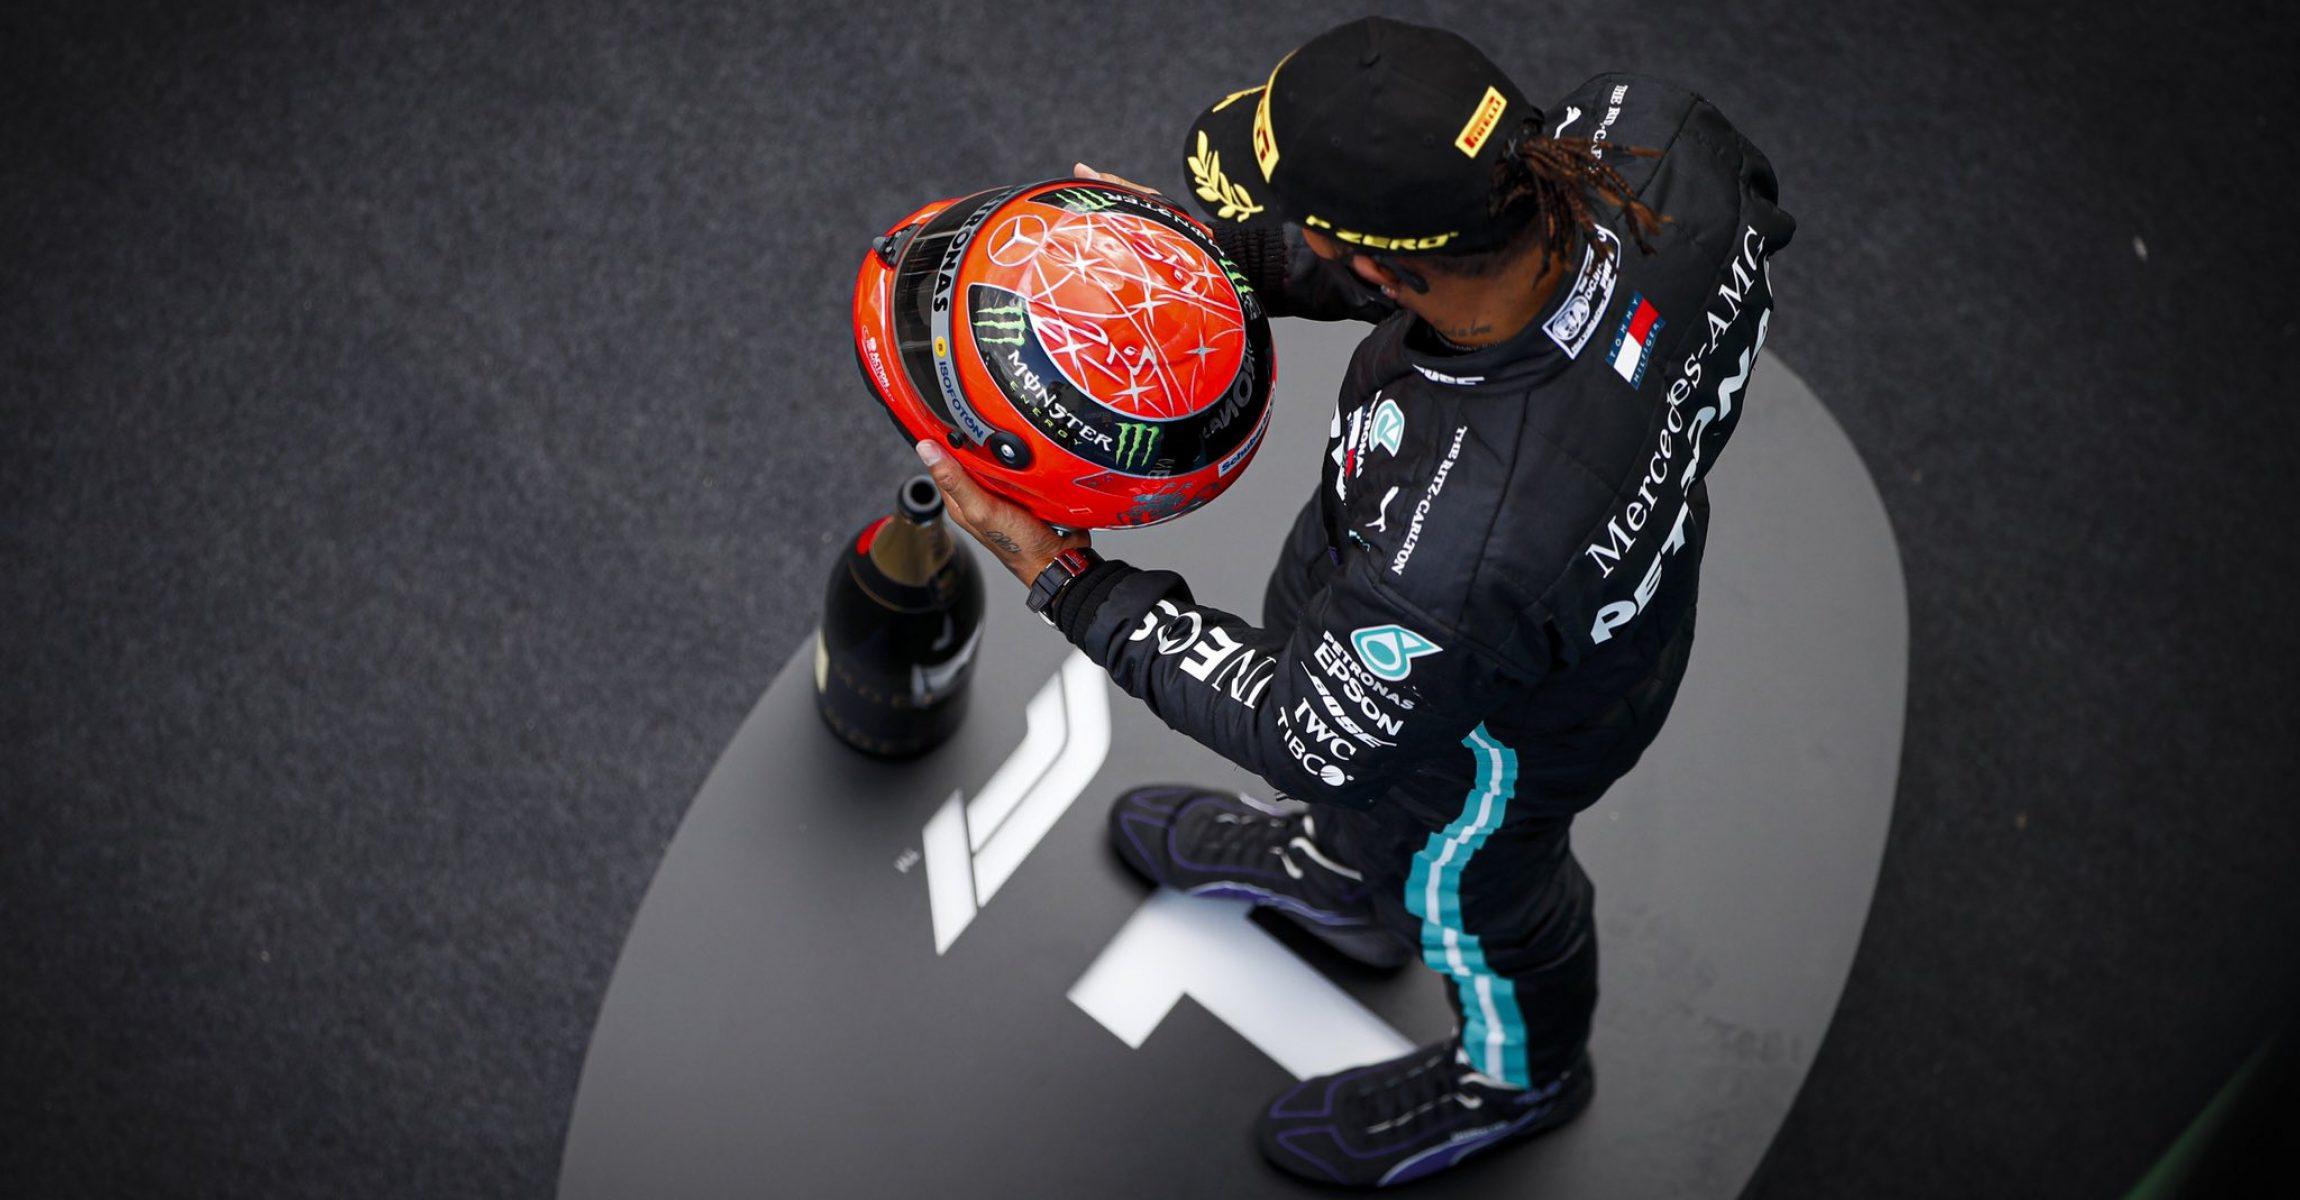 Lewis Hamilton Mercedes with Michael Schumacher's helmet